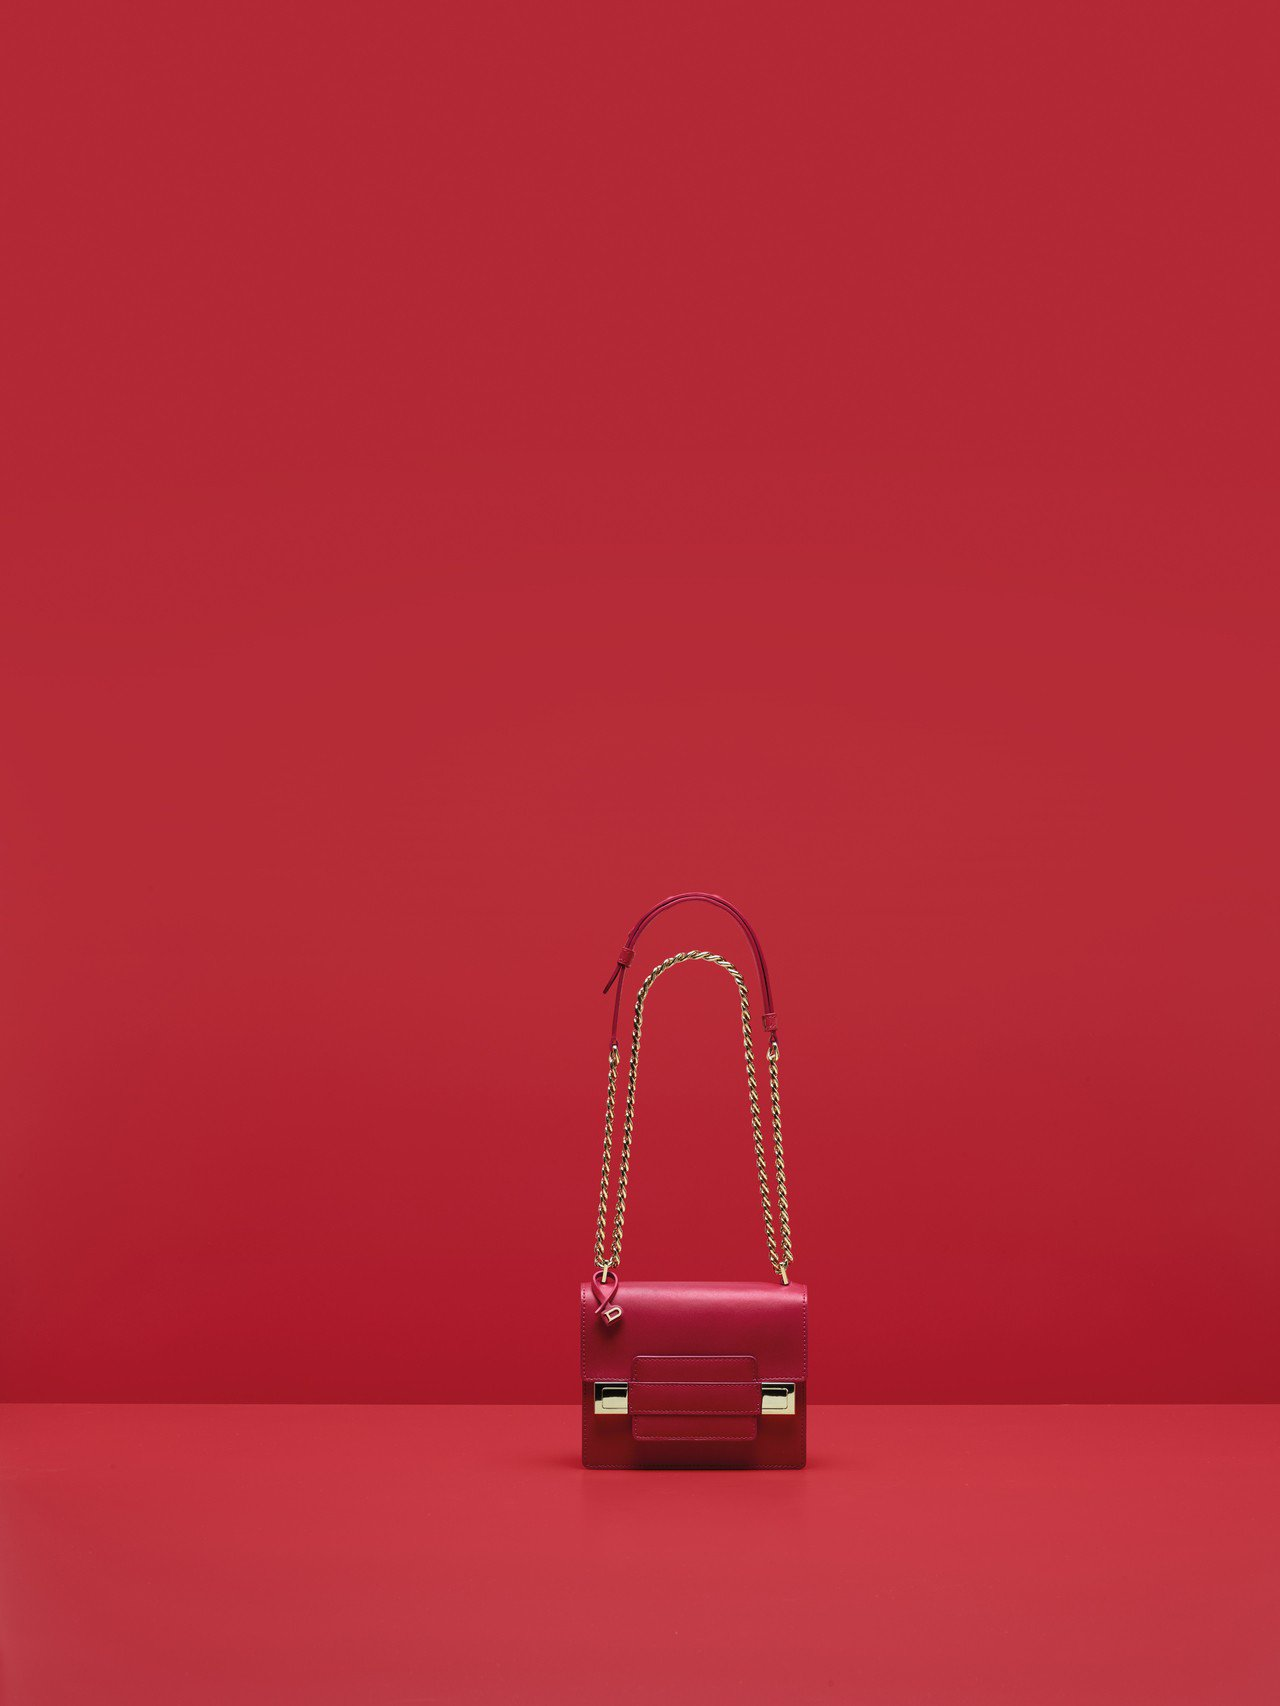 Madame覆盆莓紅小型鍊帶肩背包,價格店洽。圖/DELVAUX提供